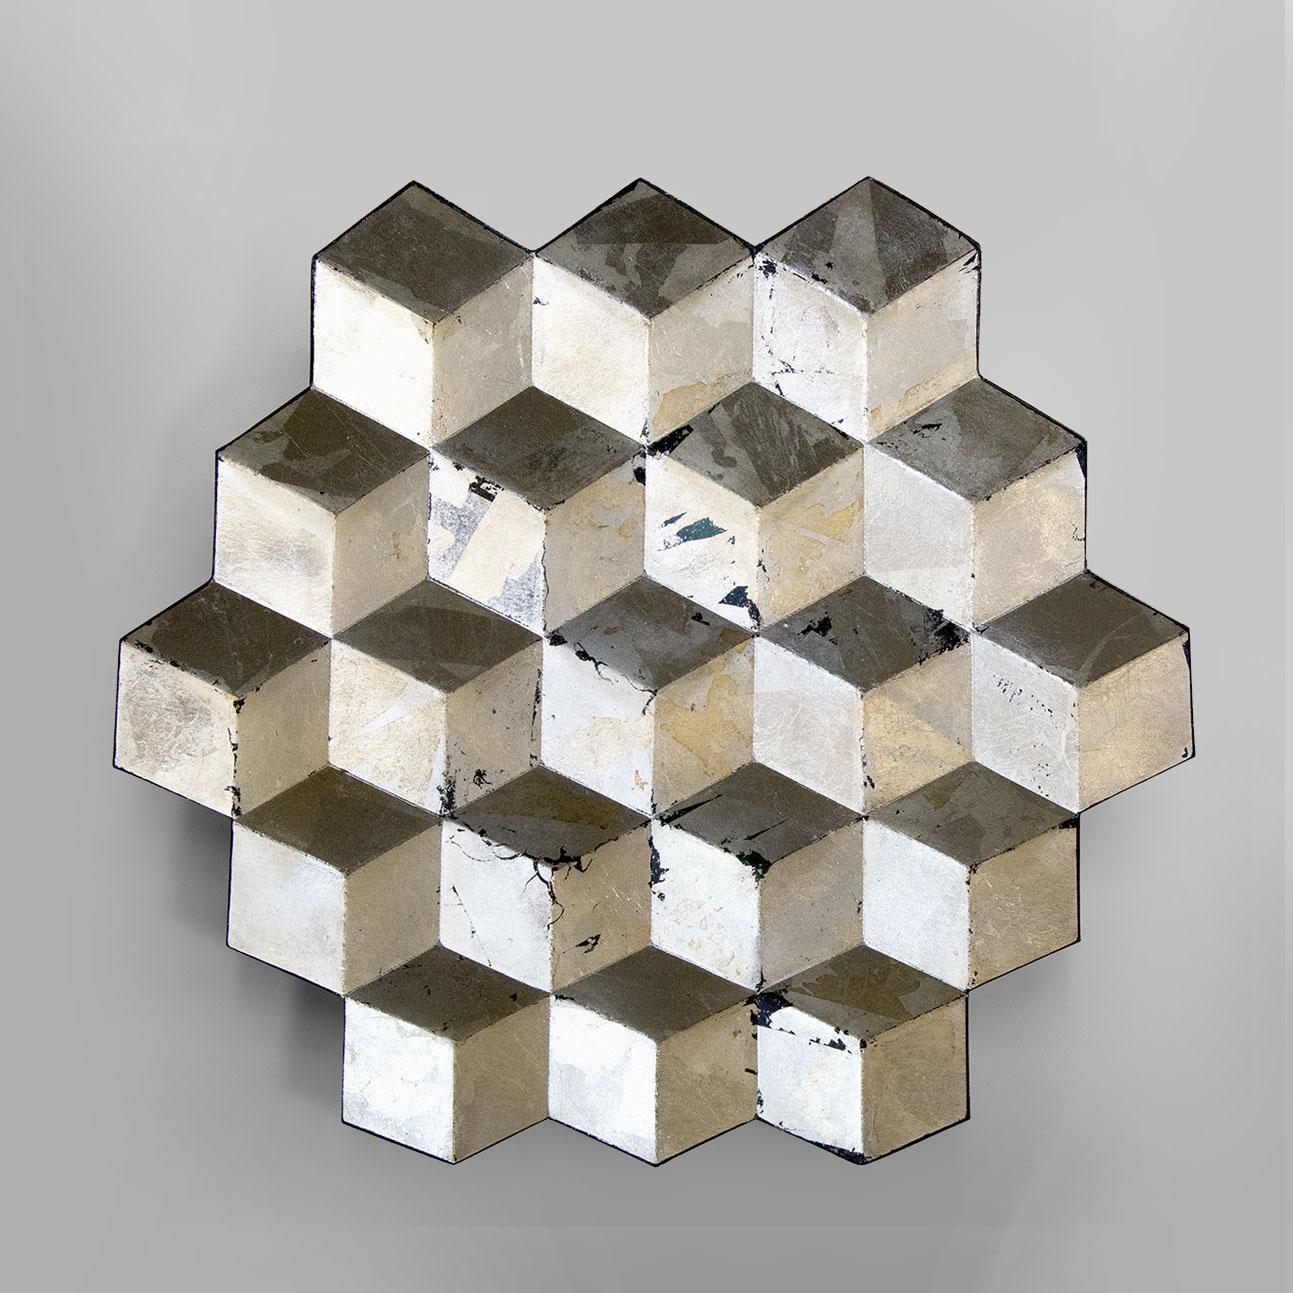 hex_silver_sq_0.jpg